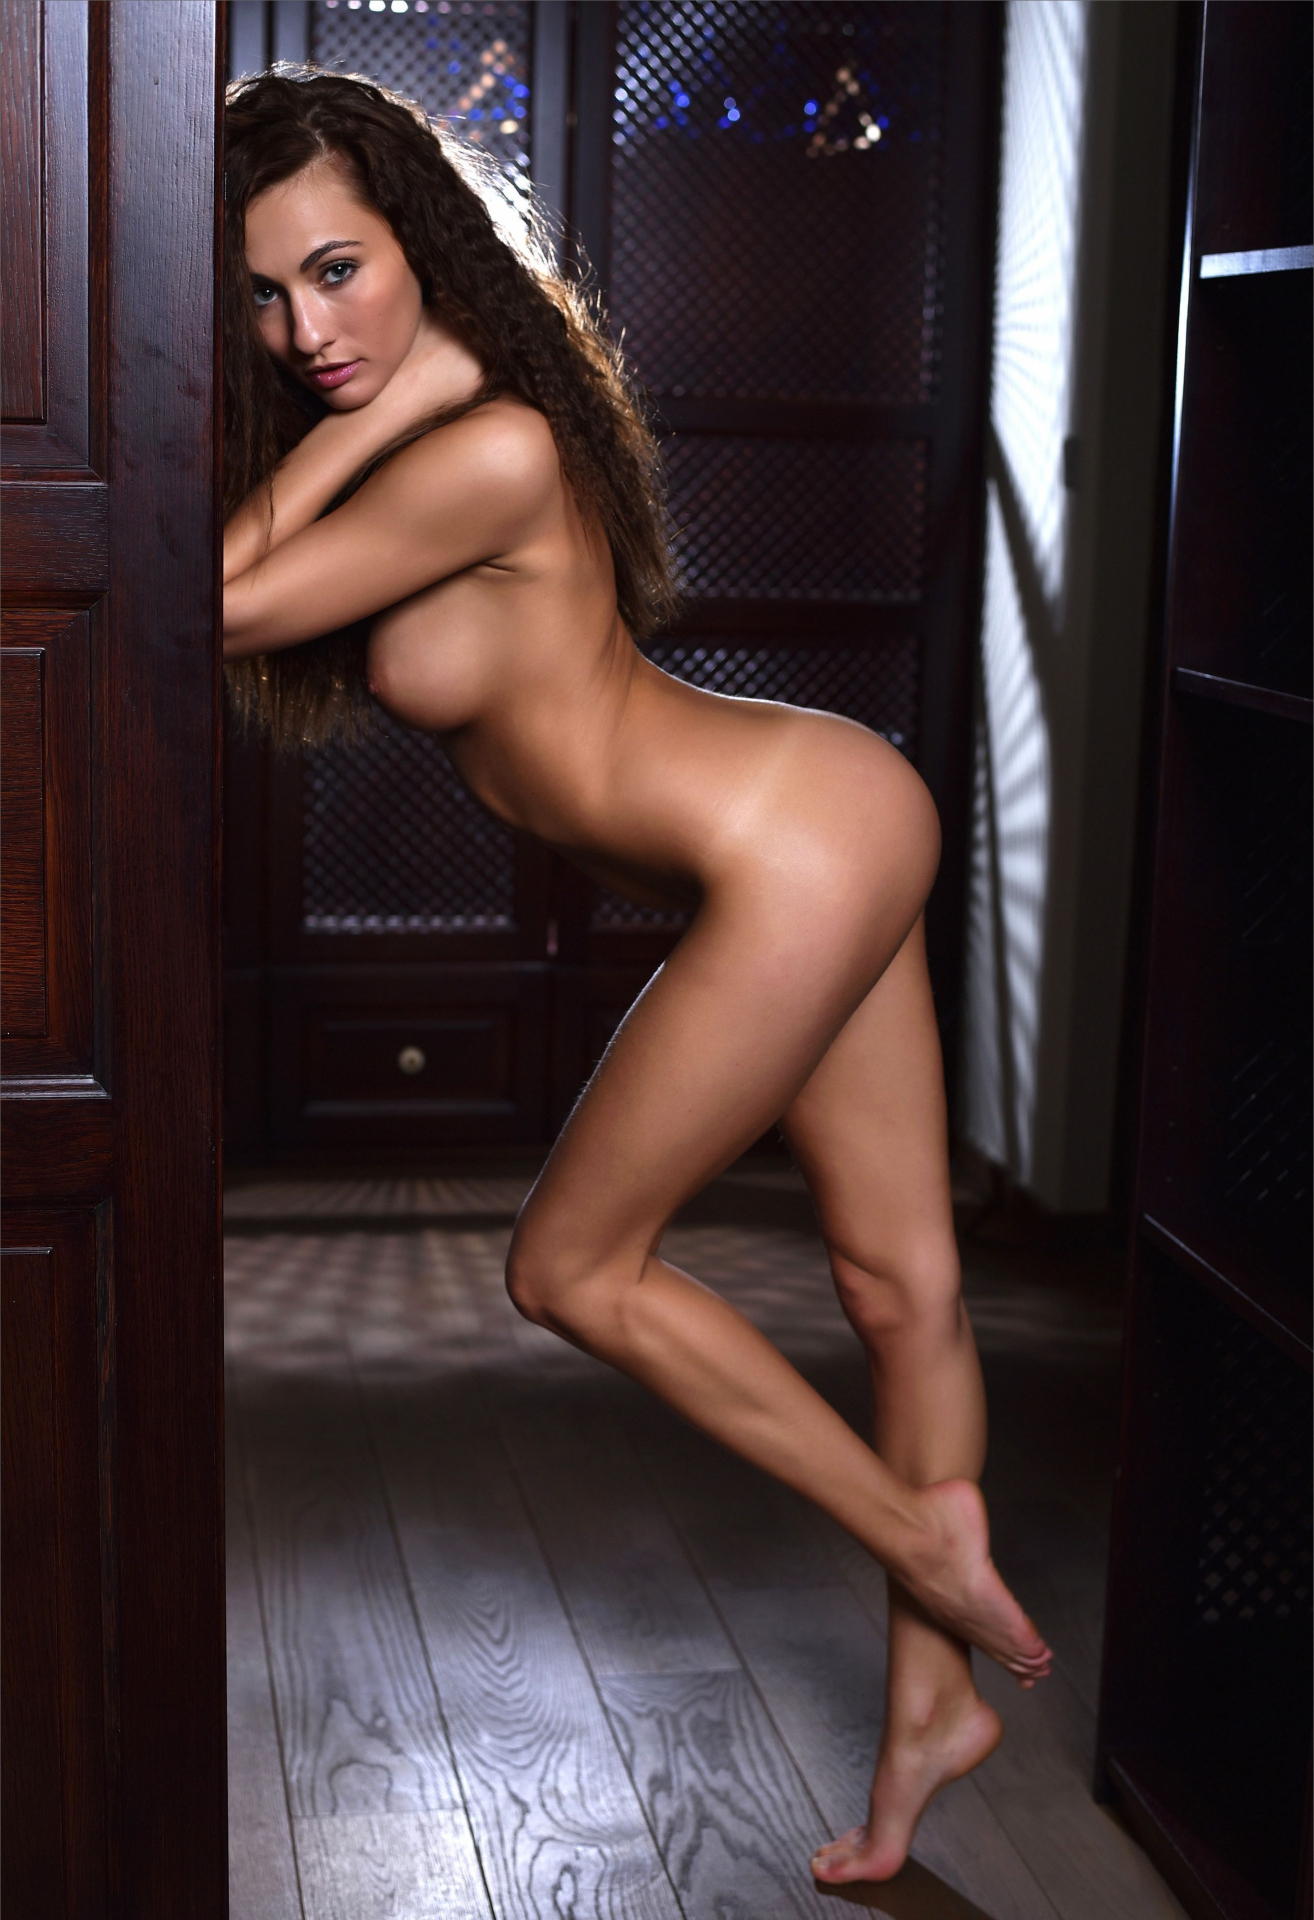 foto-pochti-golie-porno-s-russkimi-rolevimi-igrami